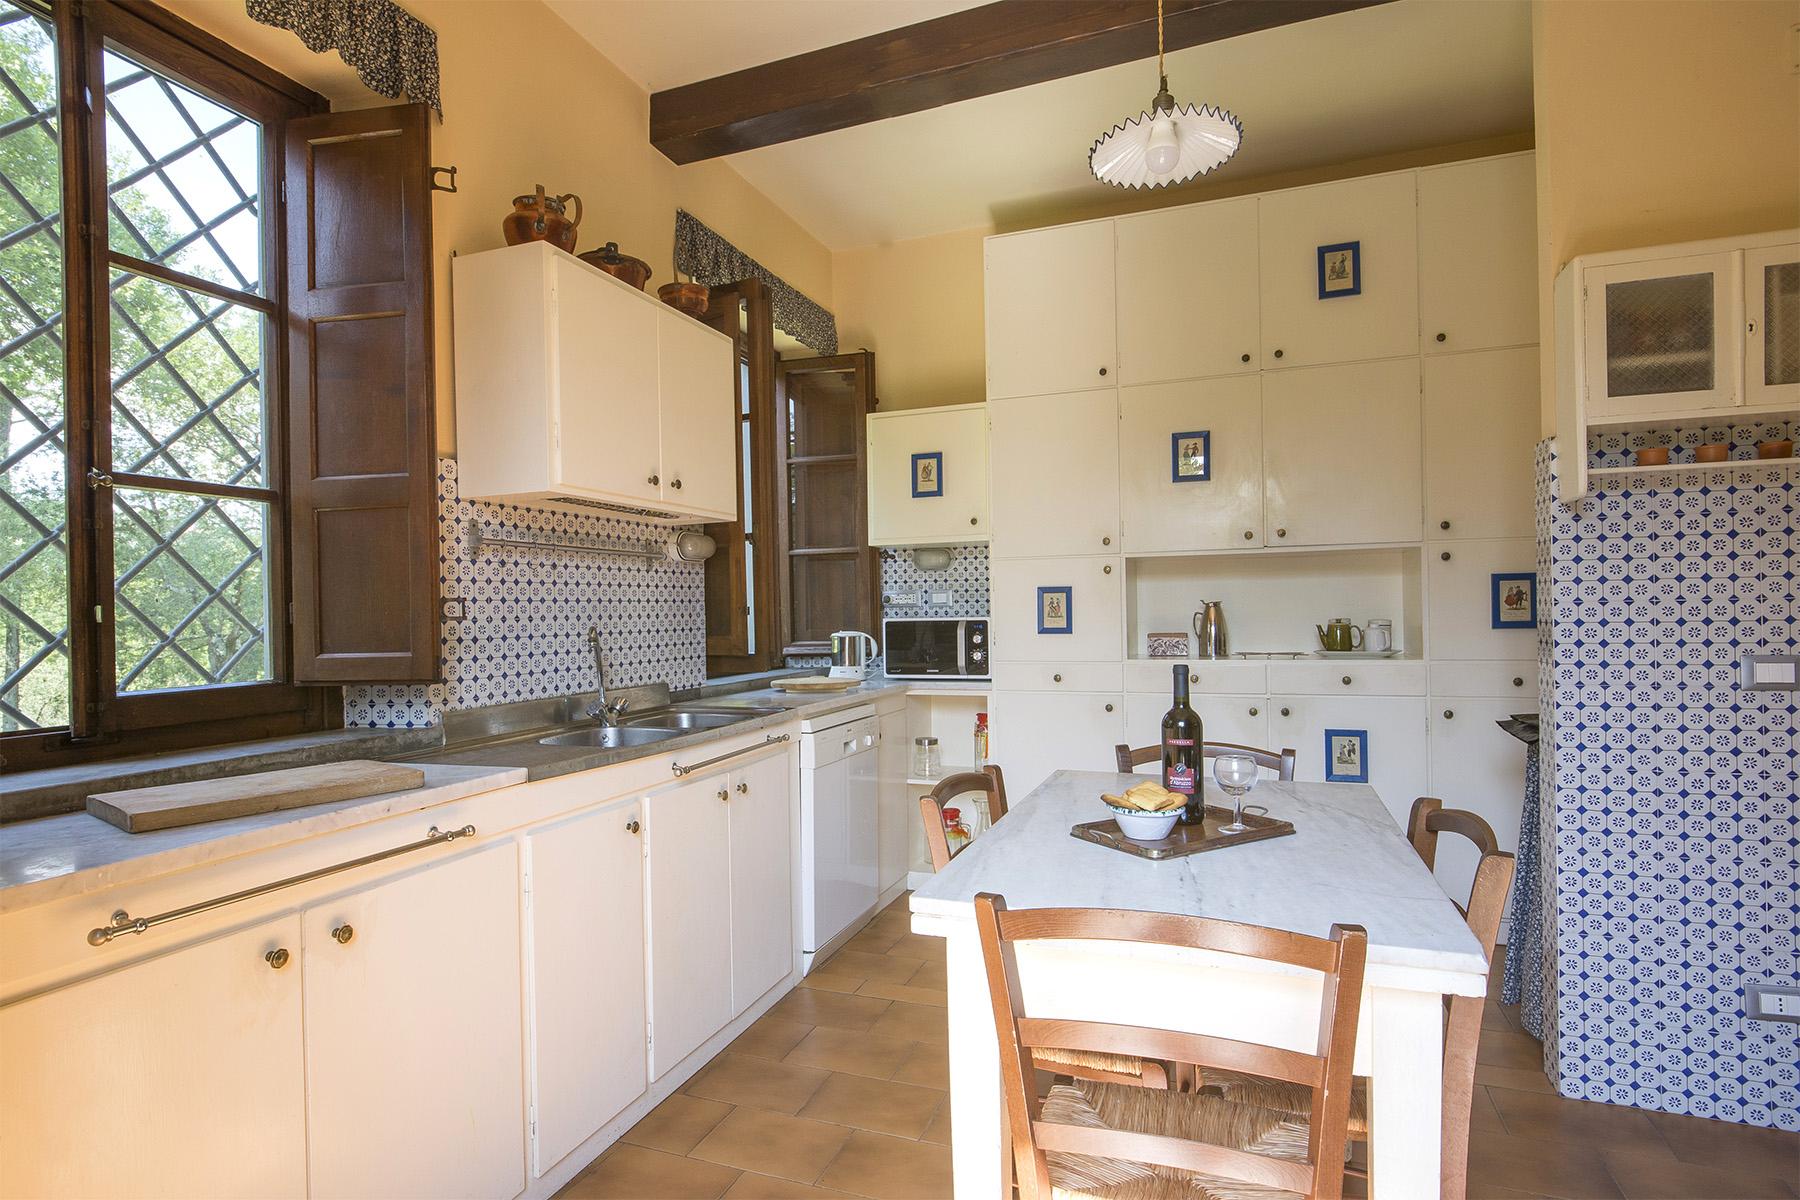 Villa in Vendita a Lucca: 5 locali, 600 mq - Foto 14